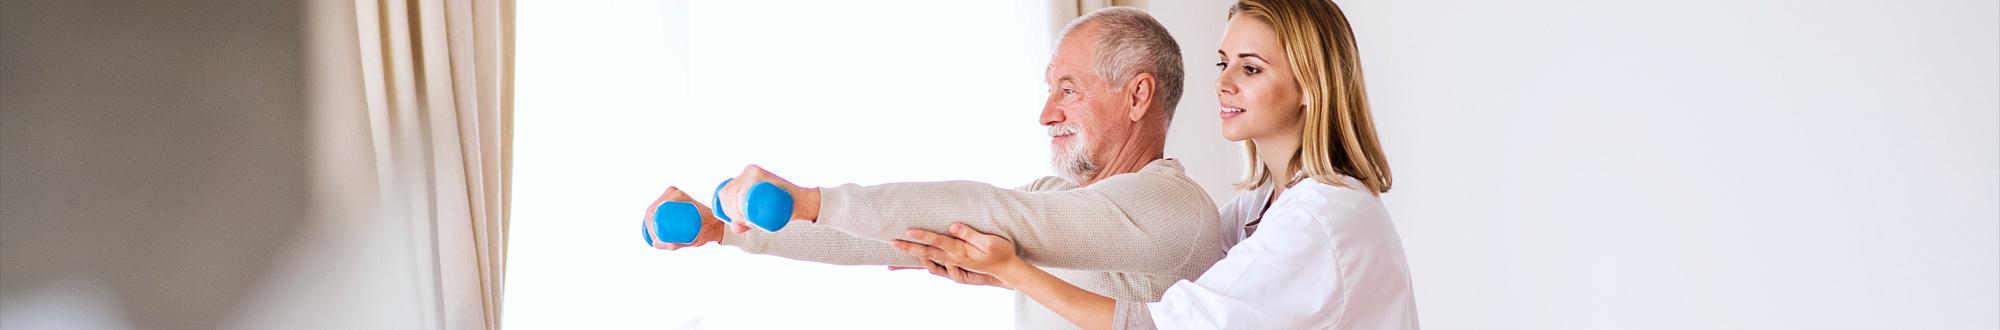 caregiver and senior man exercising